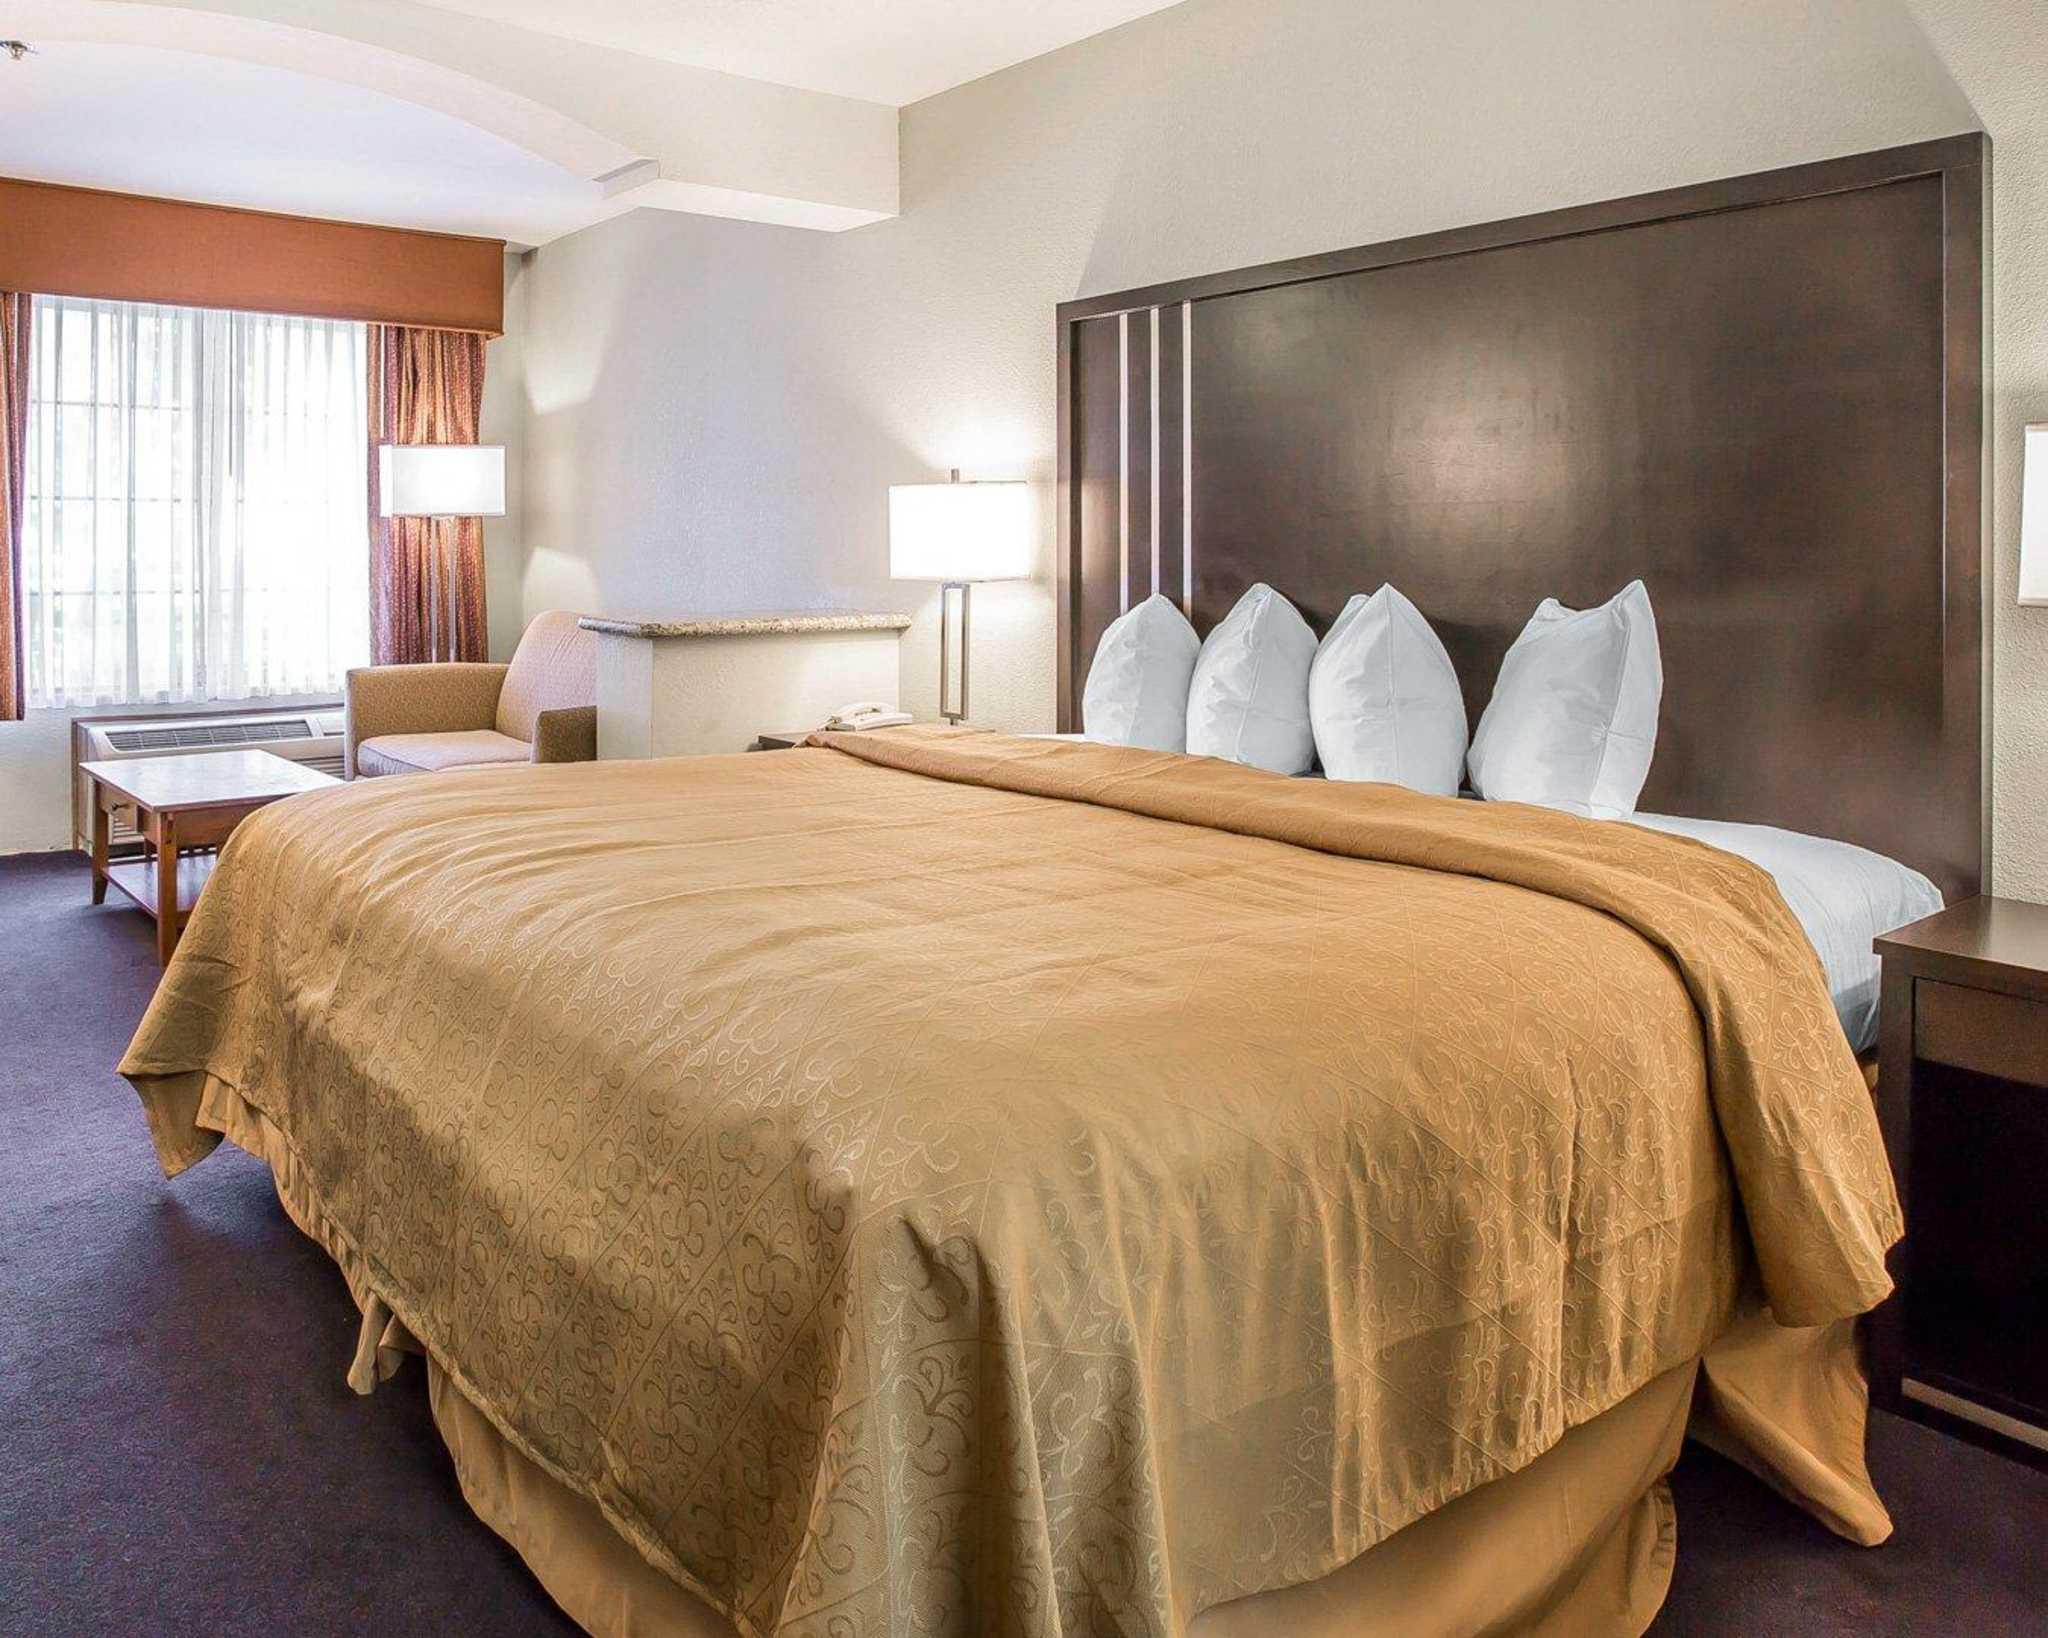 Quality Inn & Suites Woodland - Sacramento Airport image 27